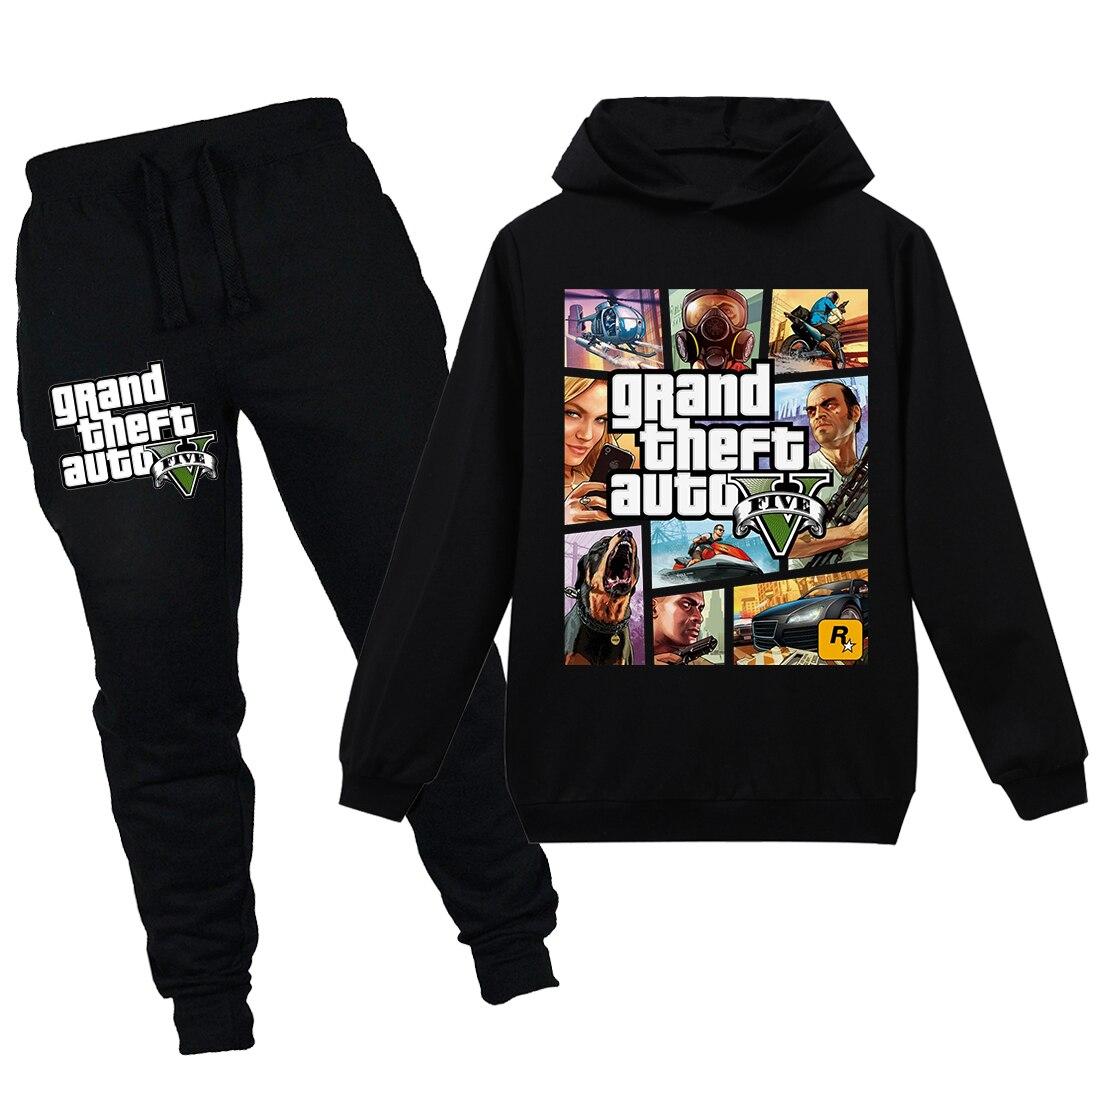 Hot Cartoon Game Grand Theft Auto V Gta 5 Baby Kids Hoodies Sets Boy Clothes T-shirt Hooded Little Girl Clothing Boys Shirt 2020